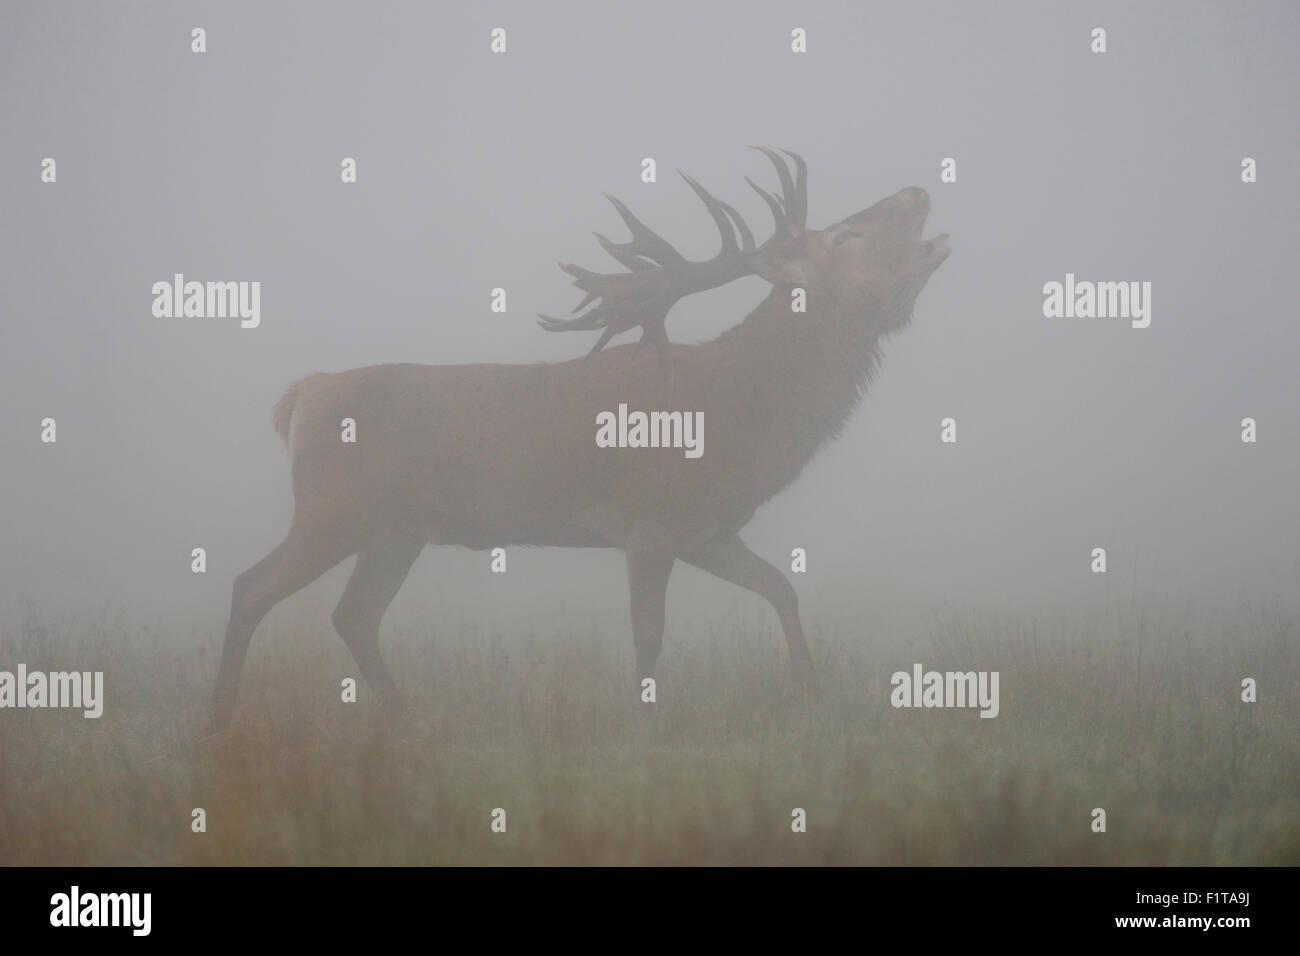 Red deer / Rothirsch ( Cervus elaphus ) stag, belling, in the mist, fog, during rutting season in autumn. Stock Photo